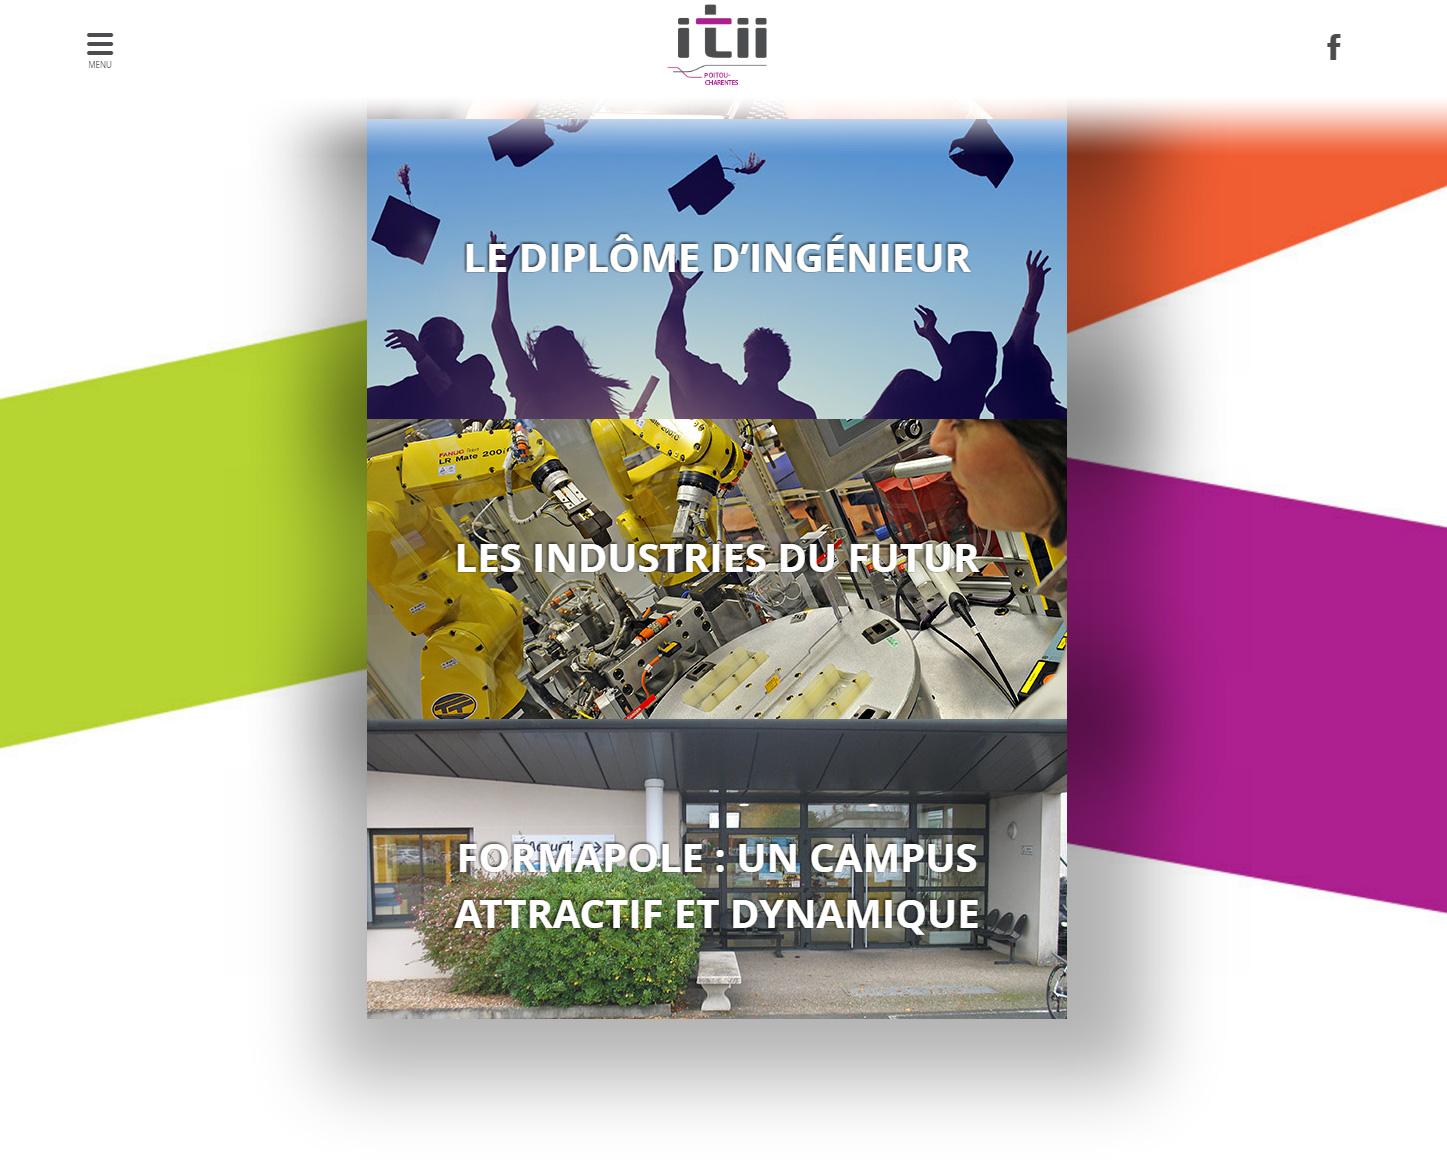 Image 2 du site internet ITII Ecole d ingenieur